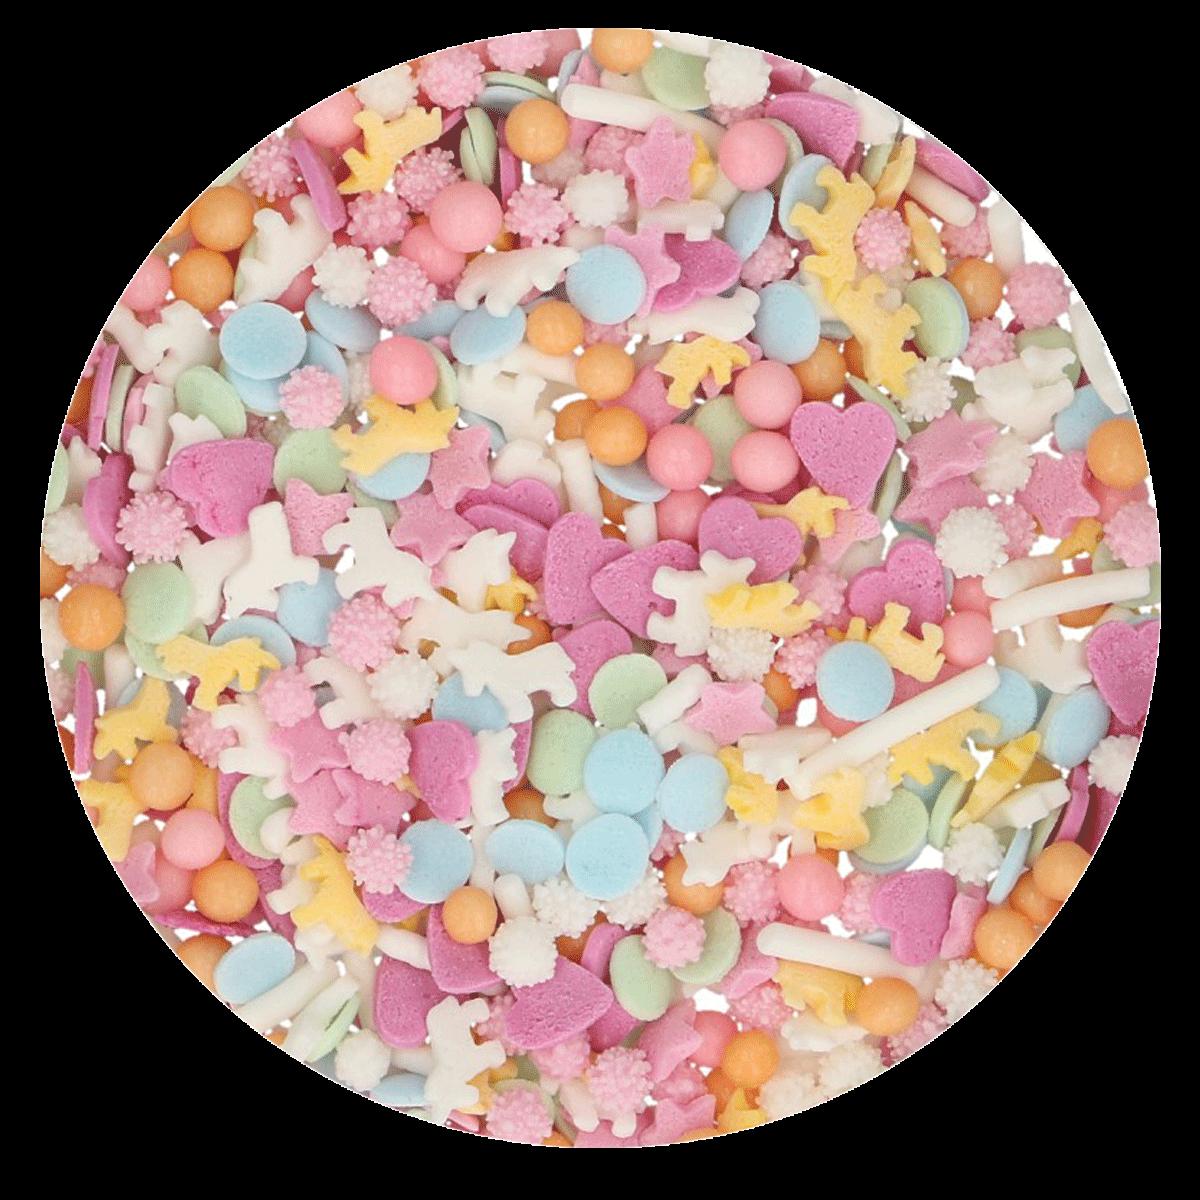 FunCakes Sprinkle Mix 50γρ -PASTEL UNICORN MEDLEY - Μείγμα Ζαχαρωτών - Μονόκερος - Παστέλ χρώματα